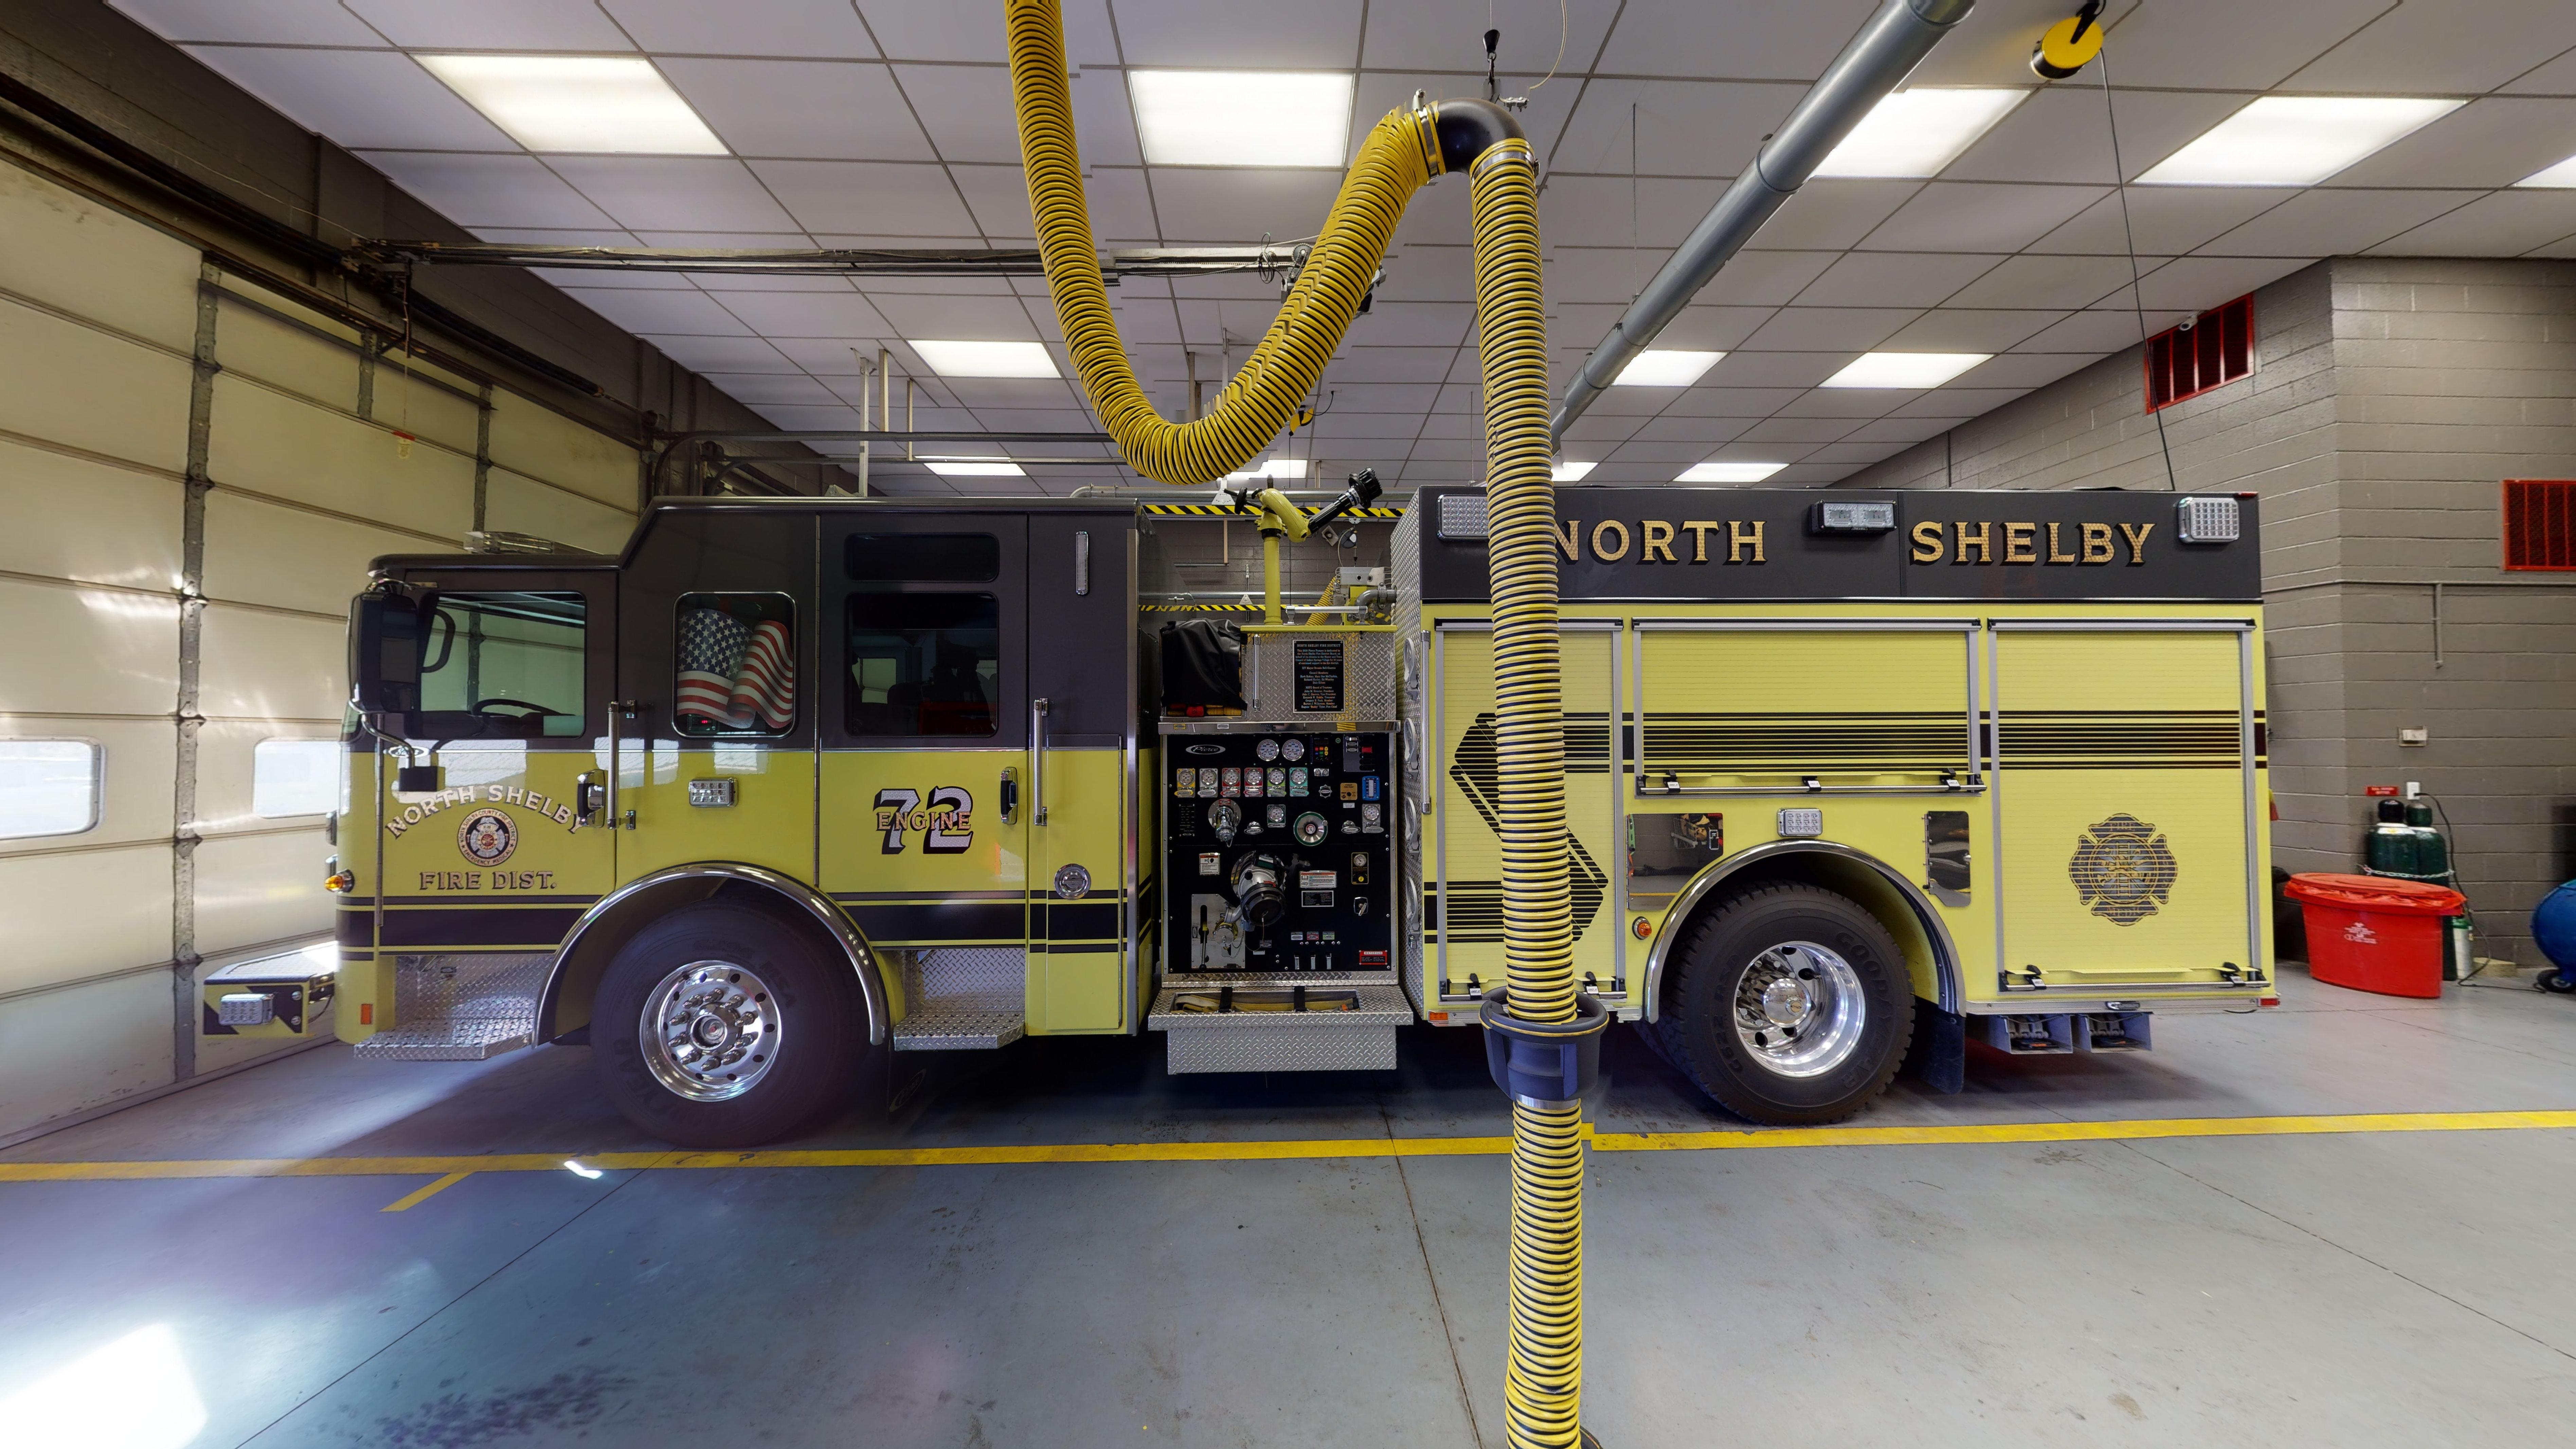 North-Shelby-Fire-District-Saber-custom-pumper-06182021_100233